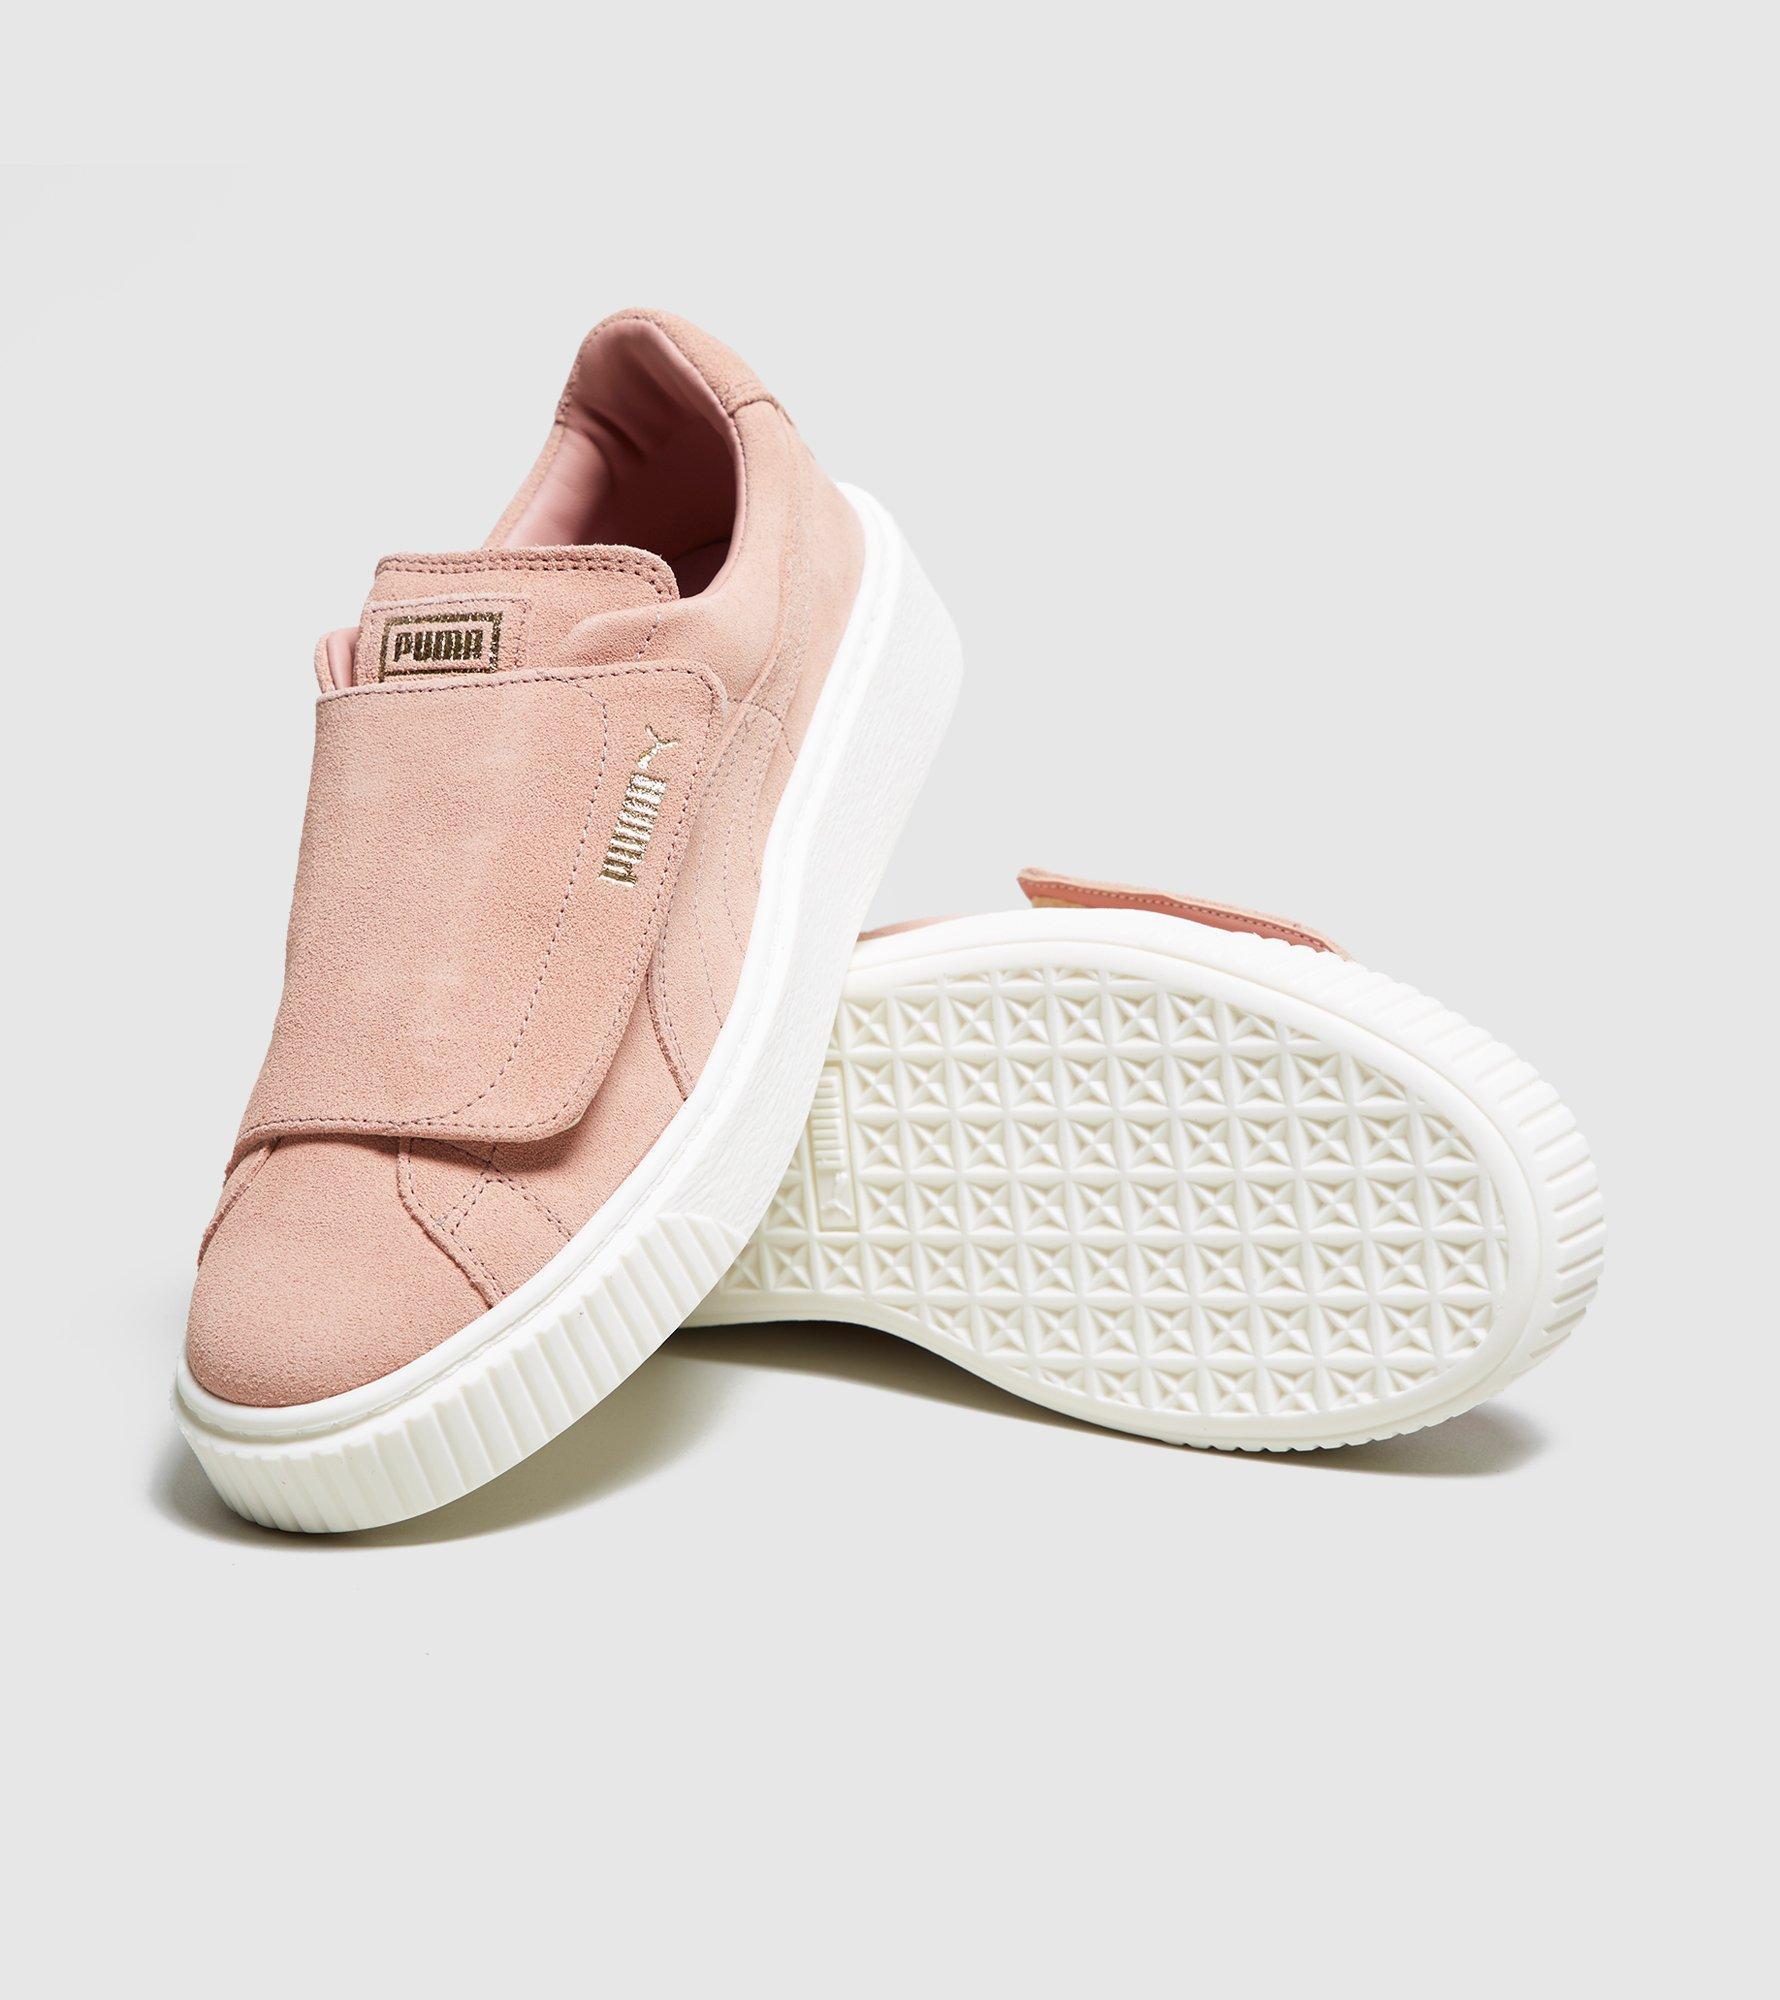 1a14cdc4c0d5 Lyst - PUMA Basket Platform Velcro Women s in Pink